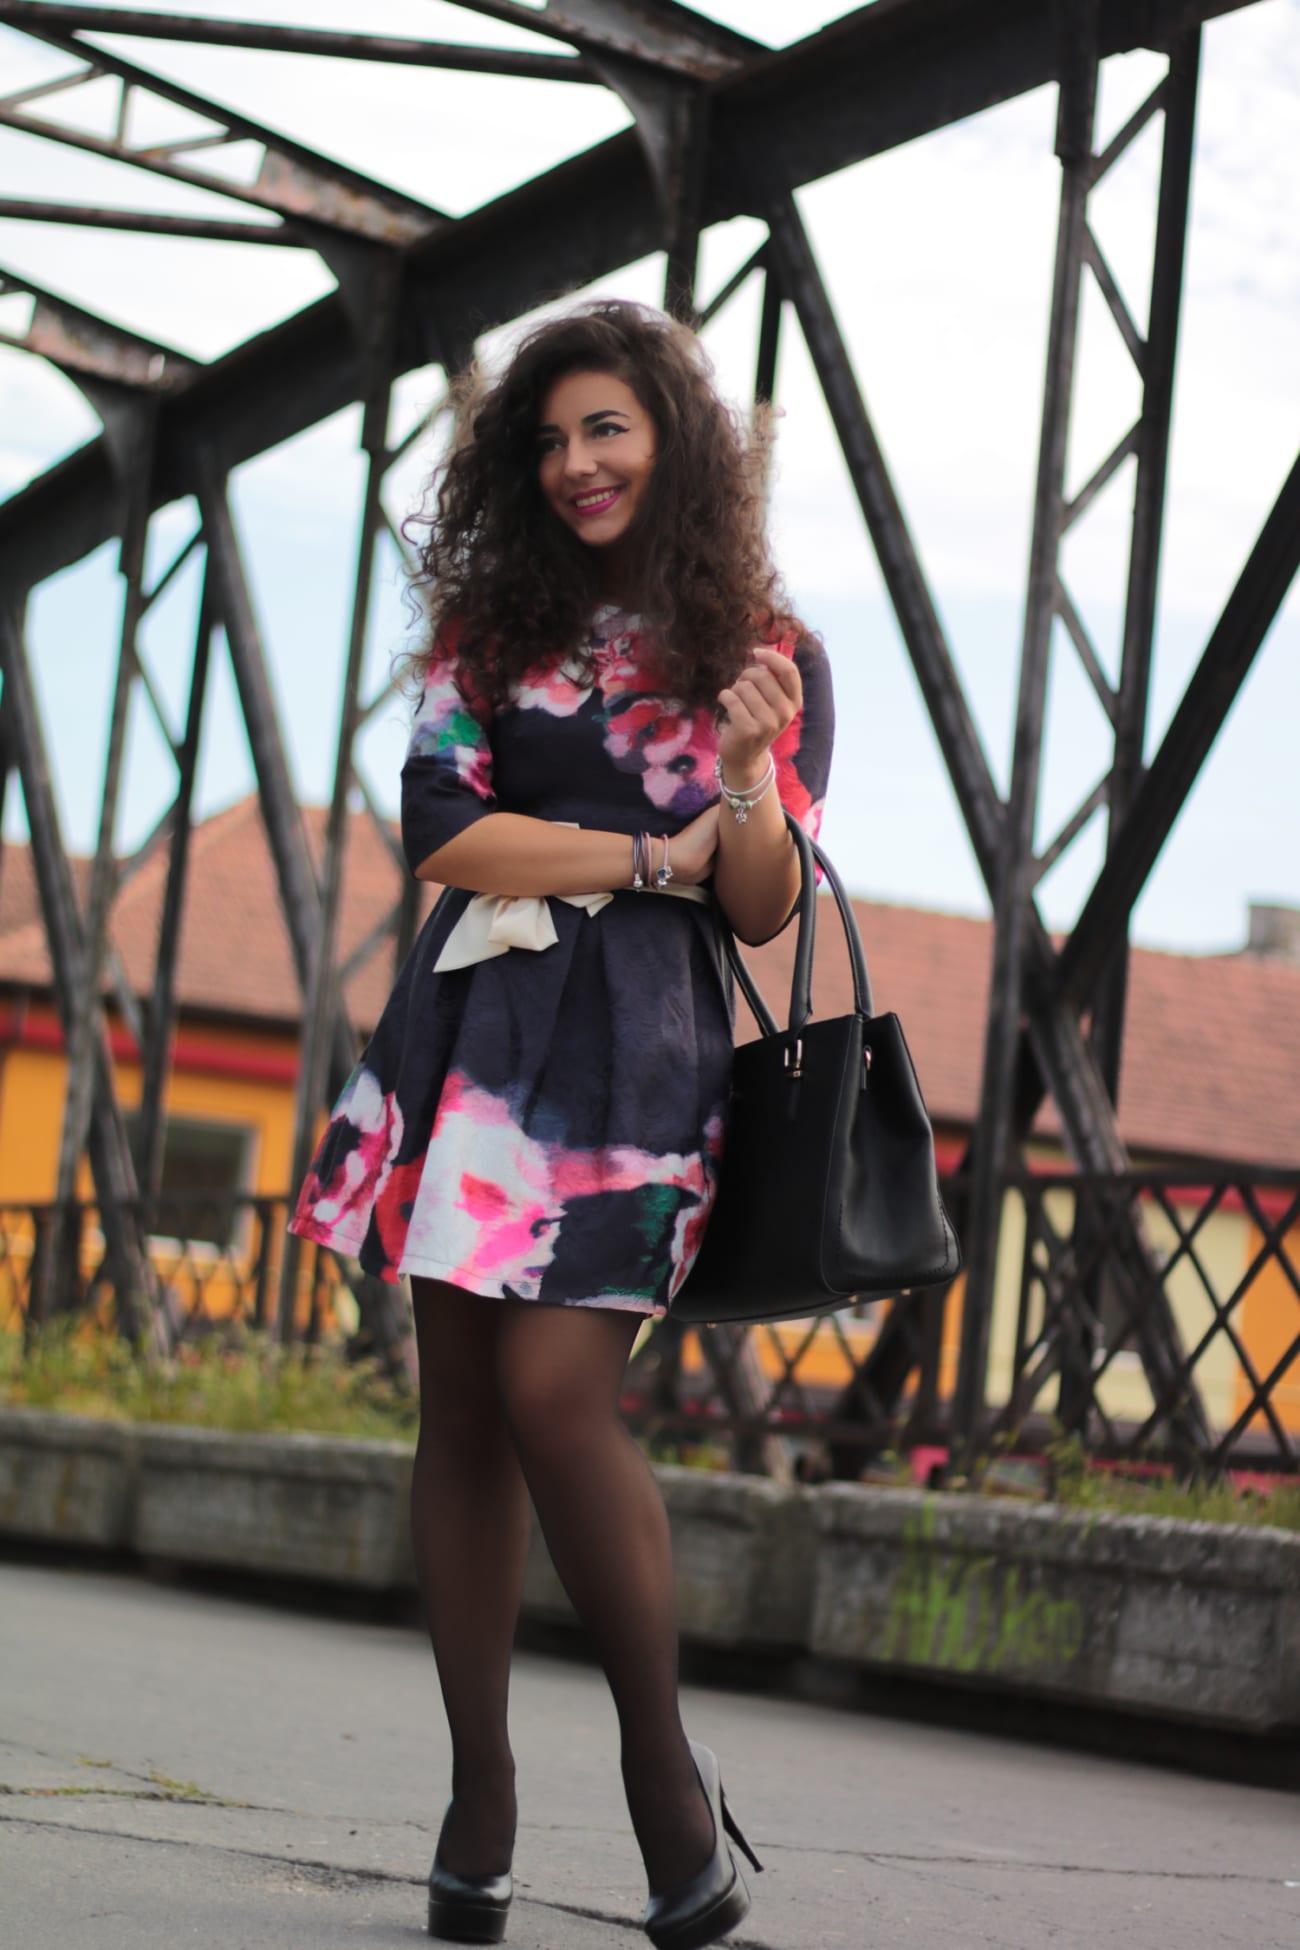 top-fashion-pareri-roxi-rose-timisoara-fashion-blogger-rochia-cu-flori-floral-dress-review-favorite-fashion-item-and-why-clothing-piece curly blogger